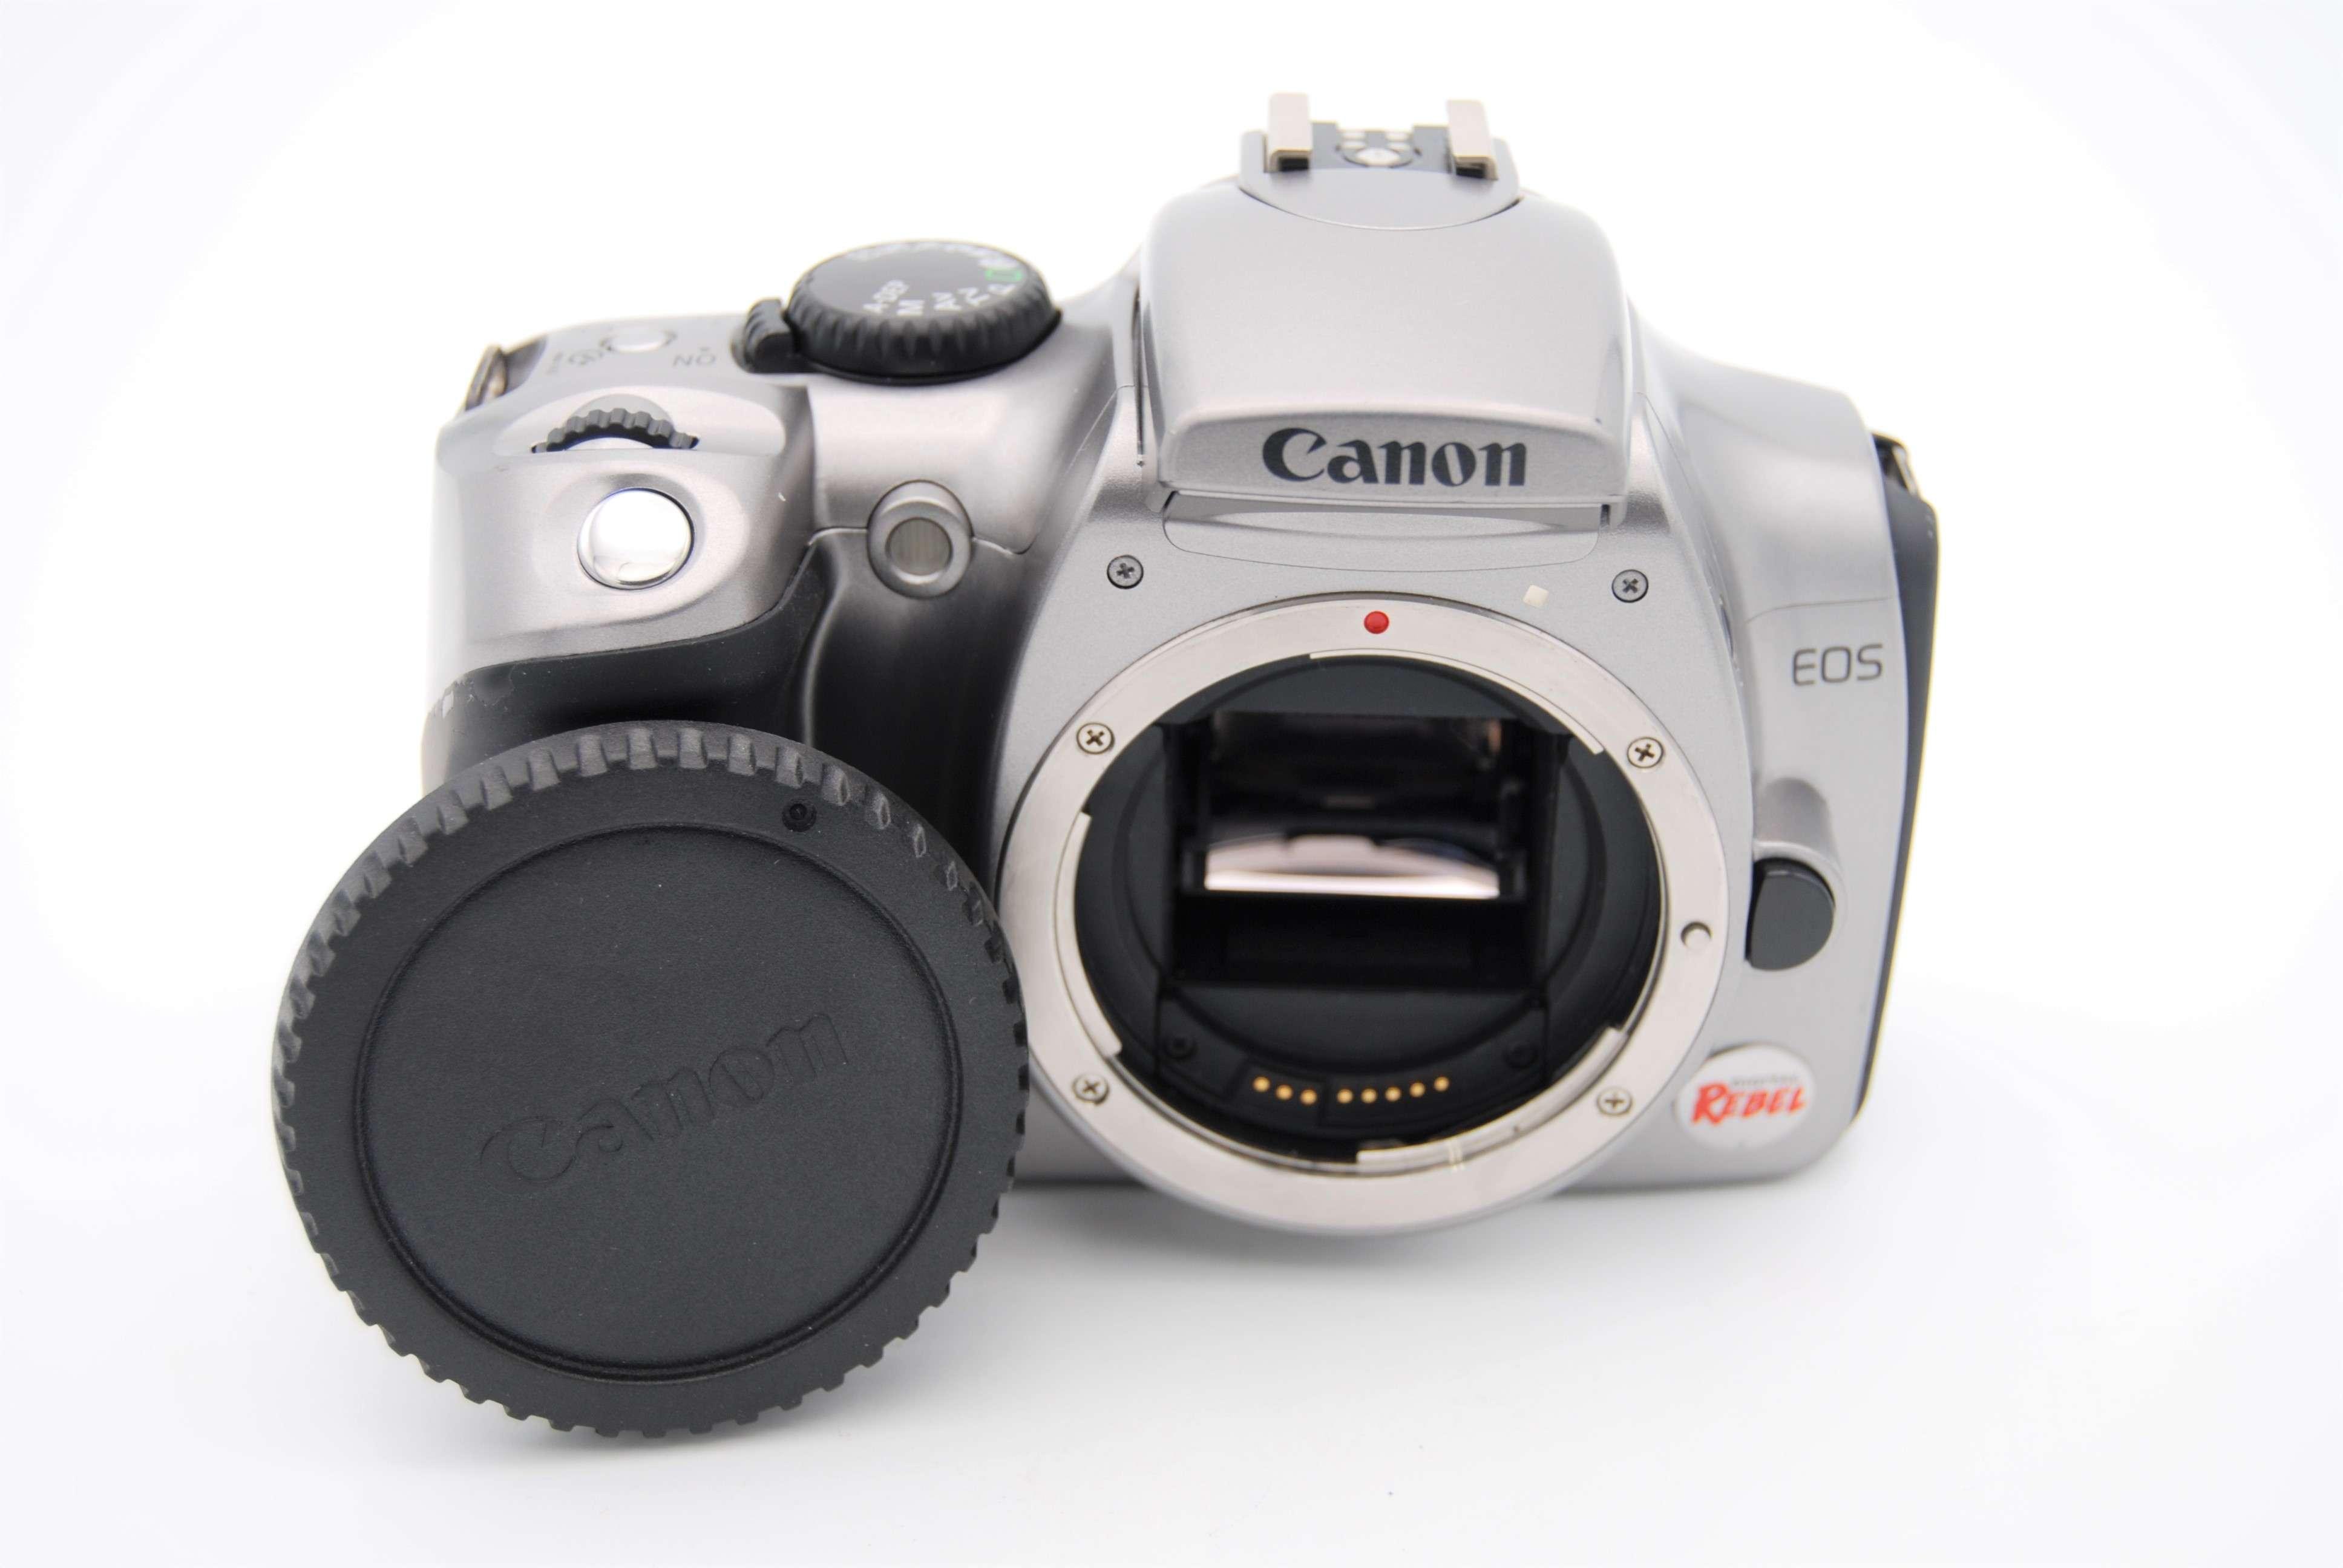 Canon EOS Digital Rebel / EOS 300D 6.3 MP Digital SLR Camera